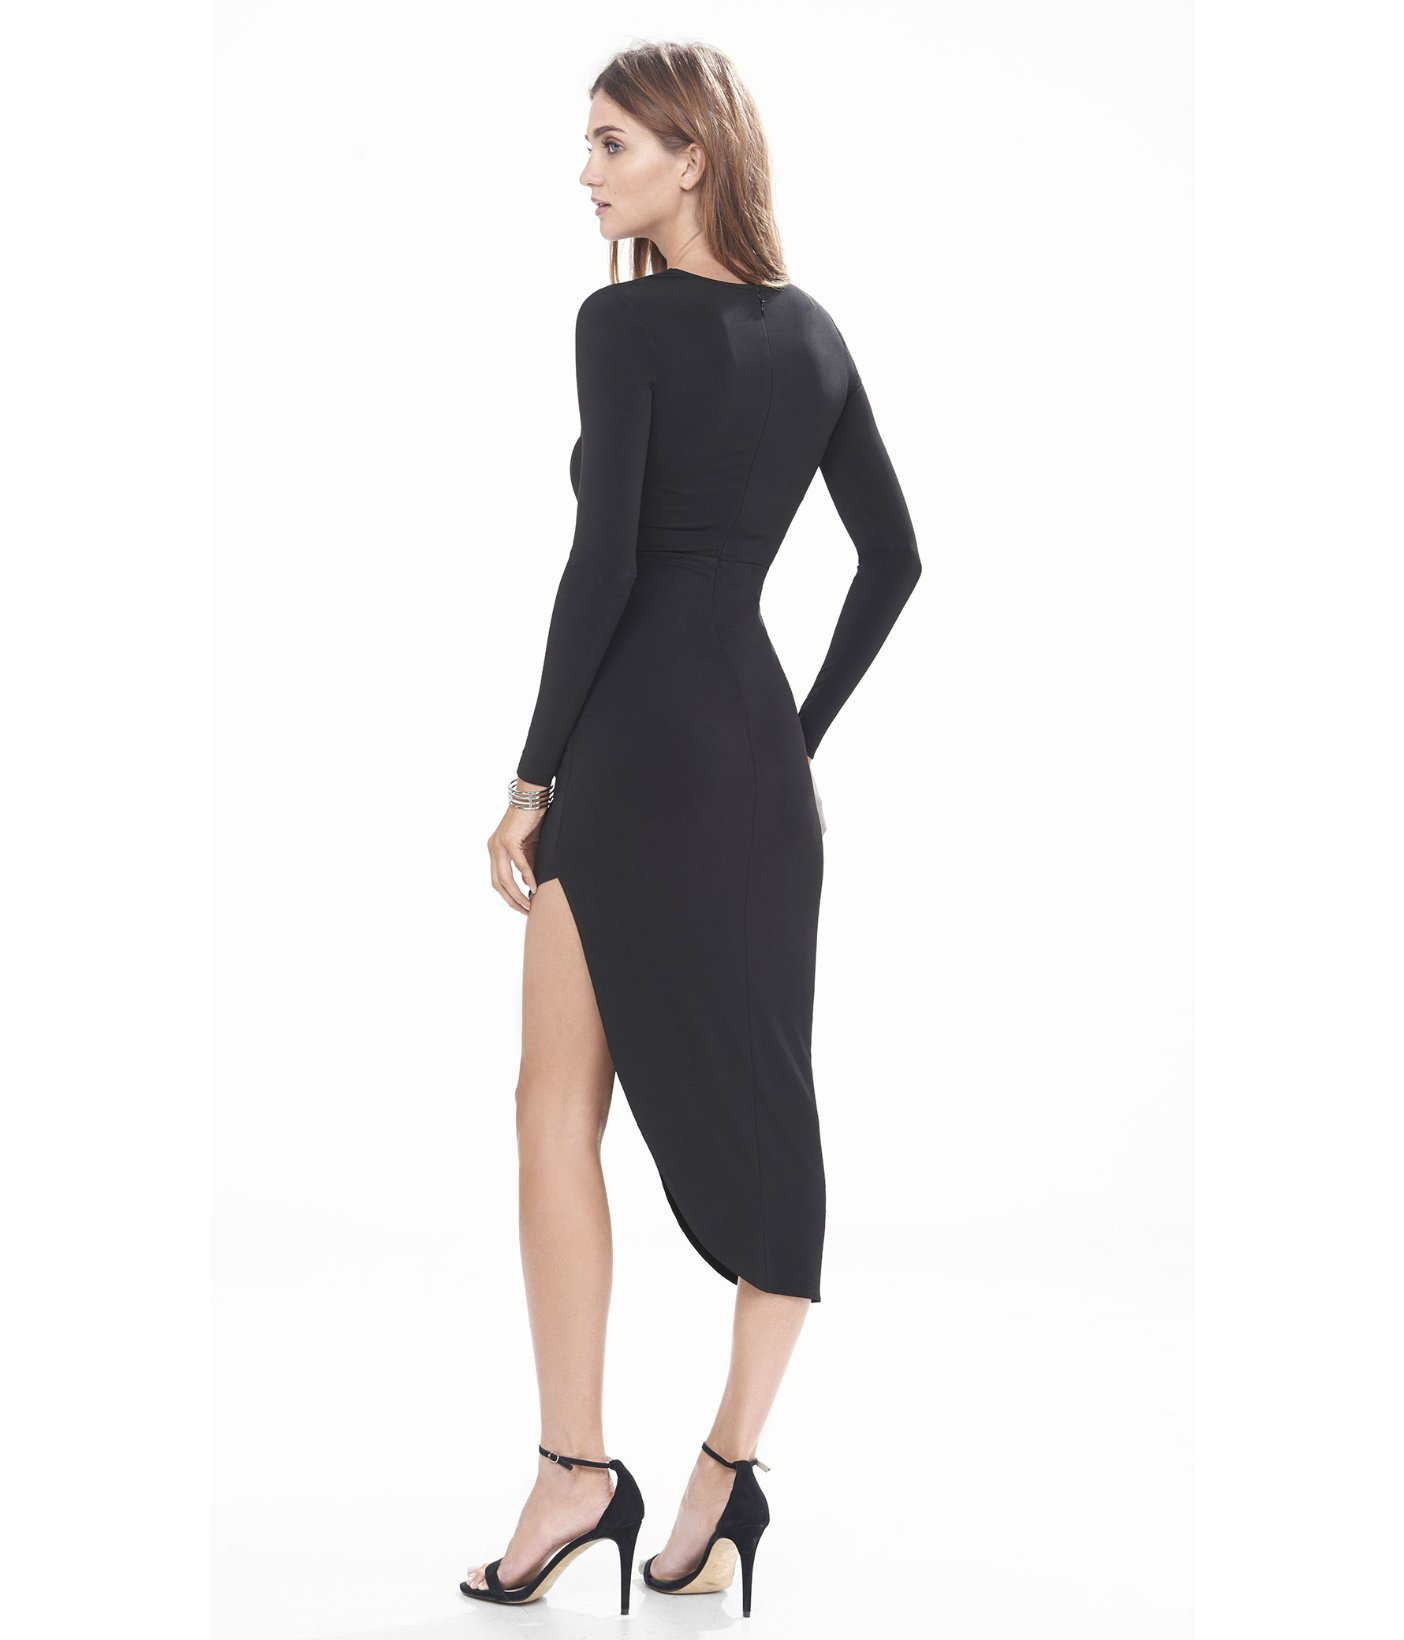 Express Black Asymmetrical Draped Hem Midi Dress in Black  Lyst